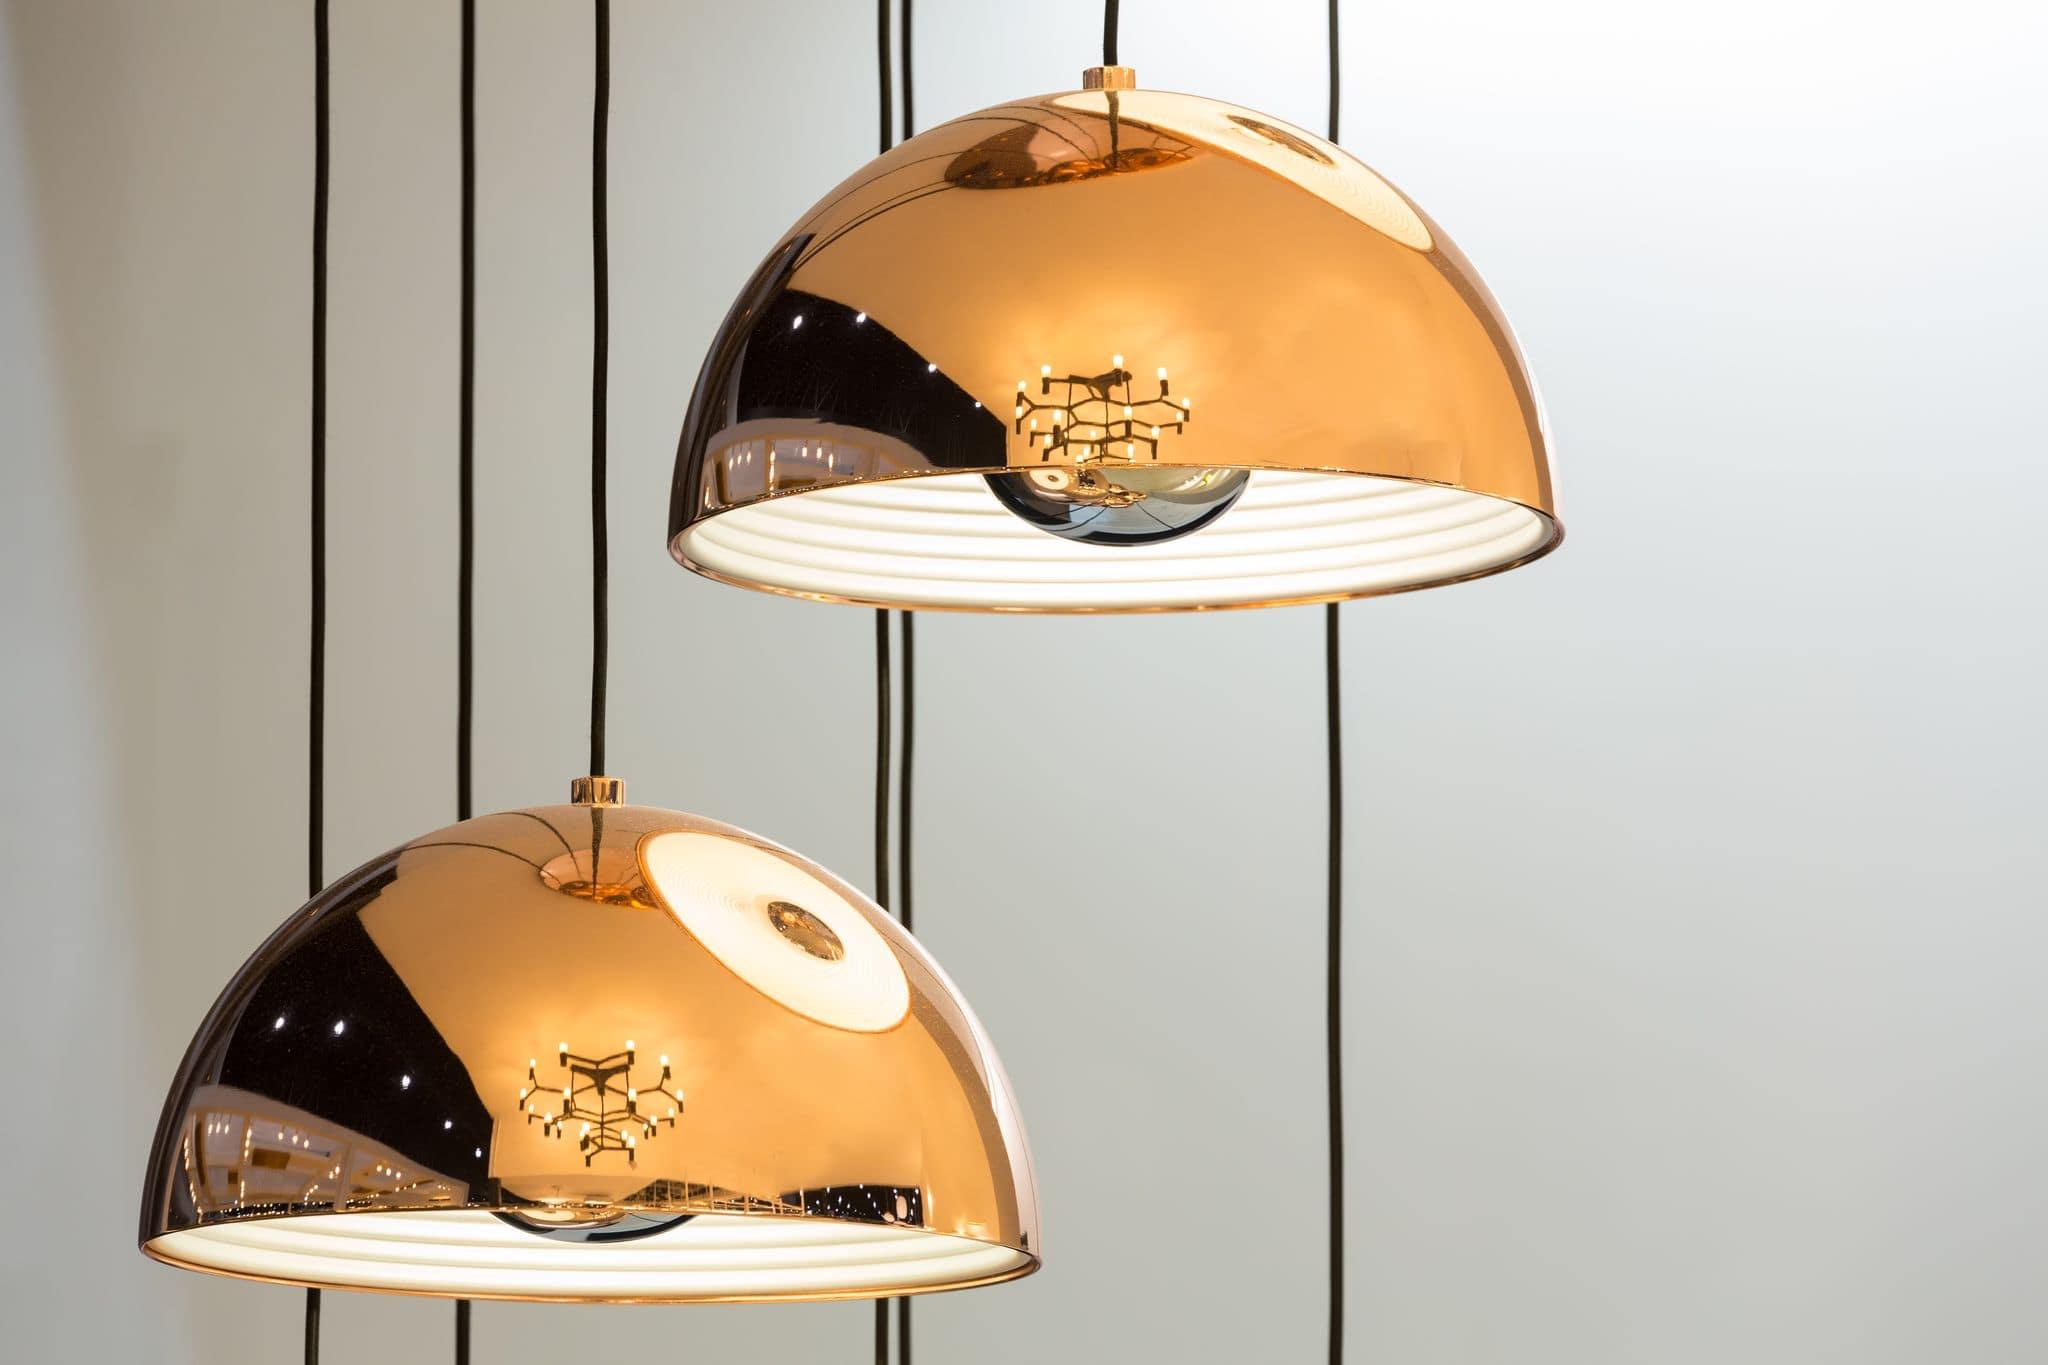 Copper lampshades to add bloom to monochromatic interior